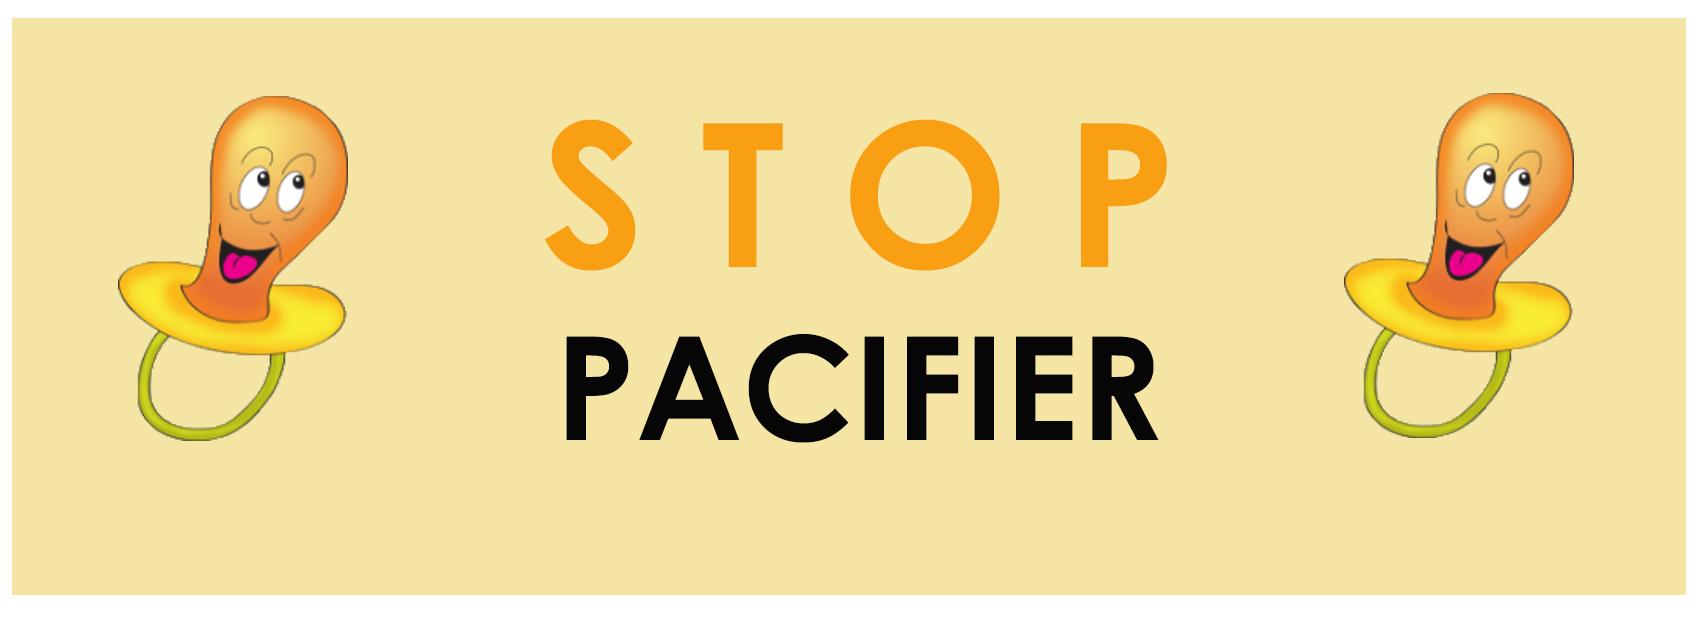 stop-pacifier-orofacial-myology